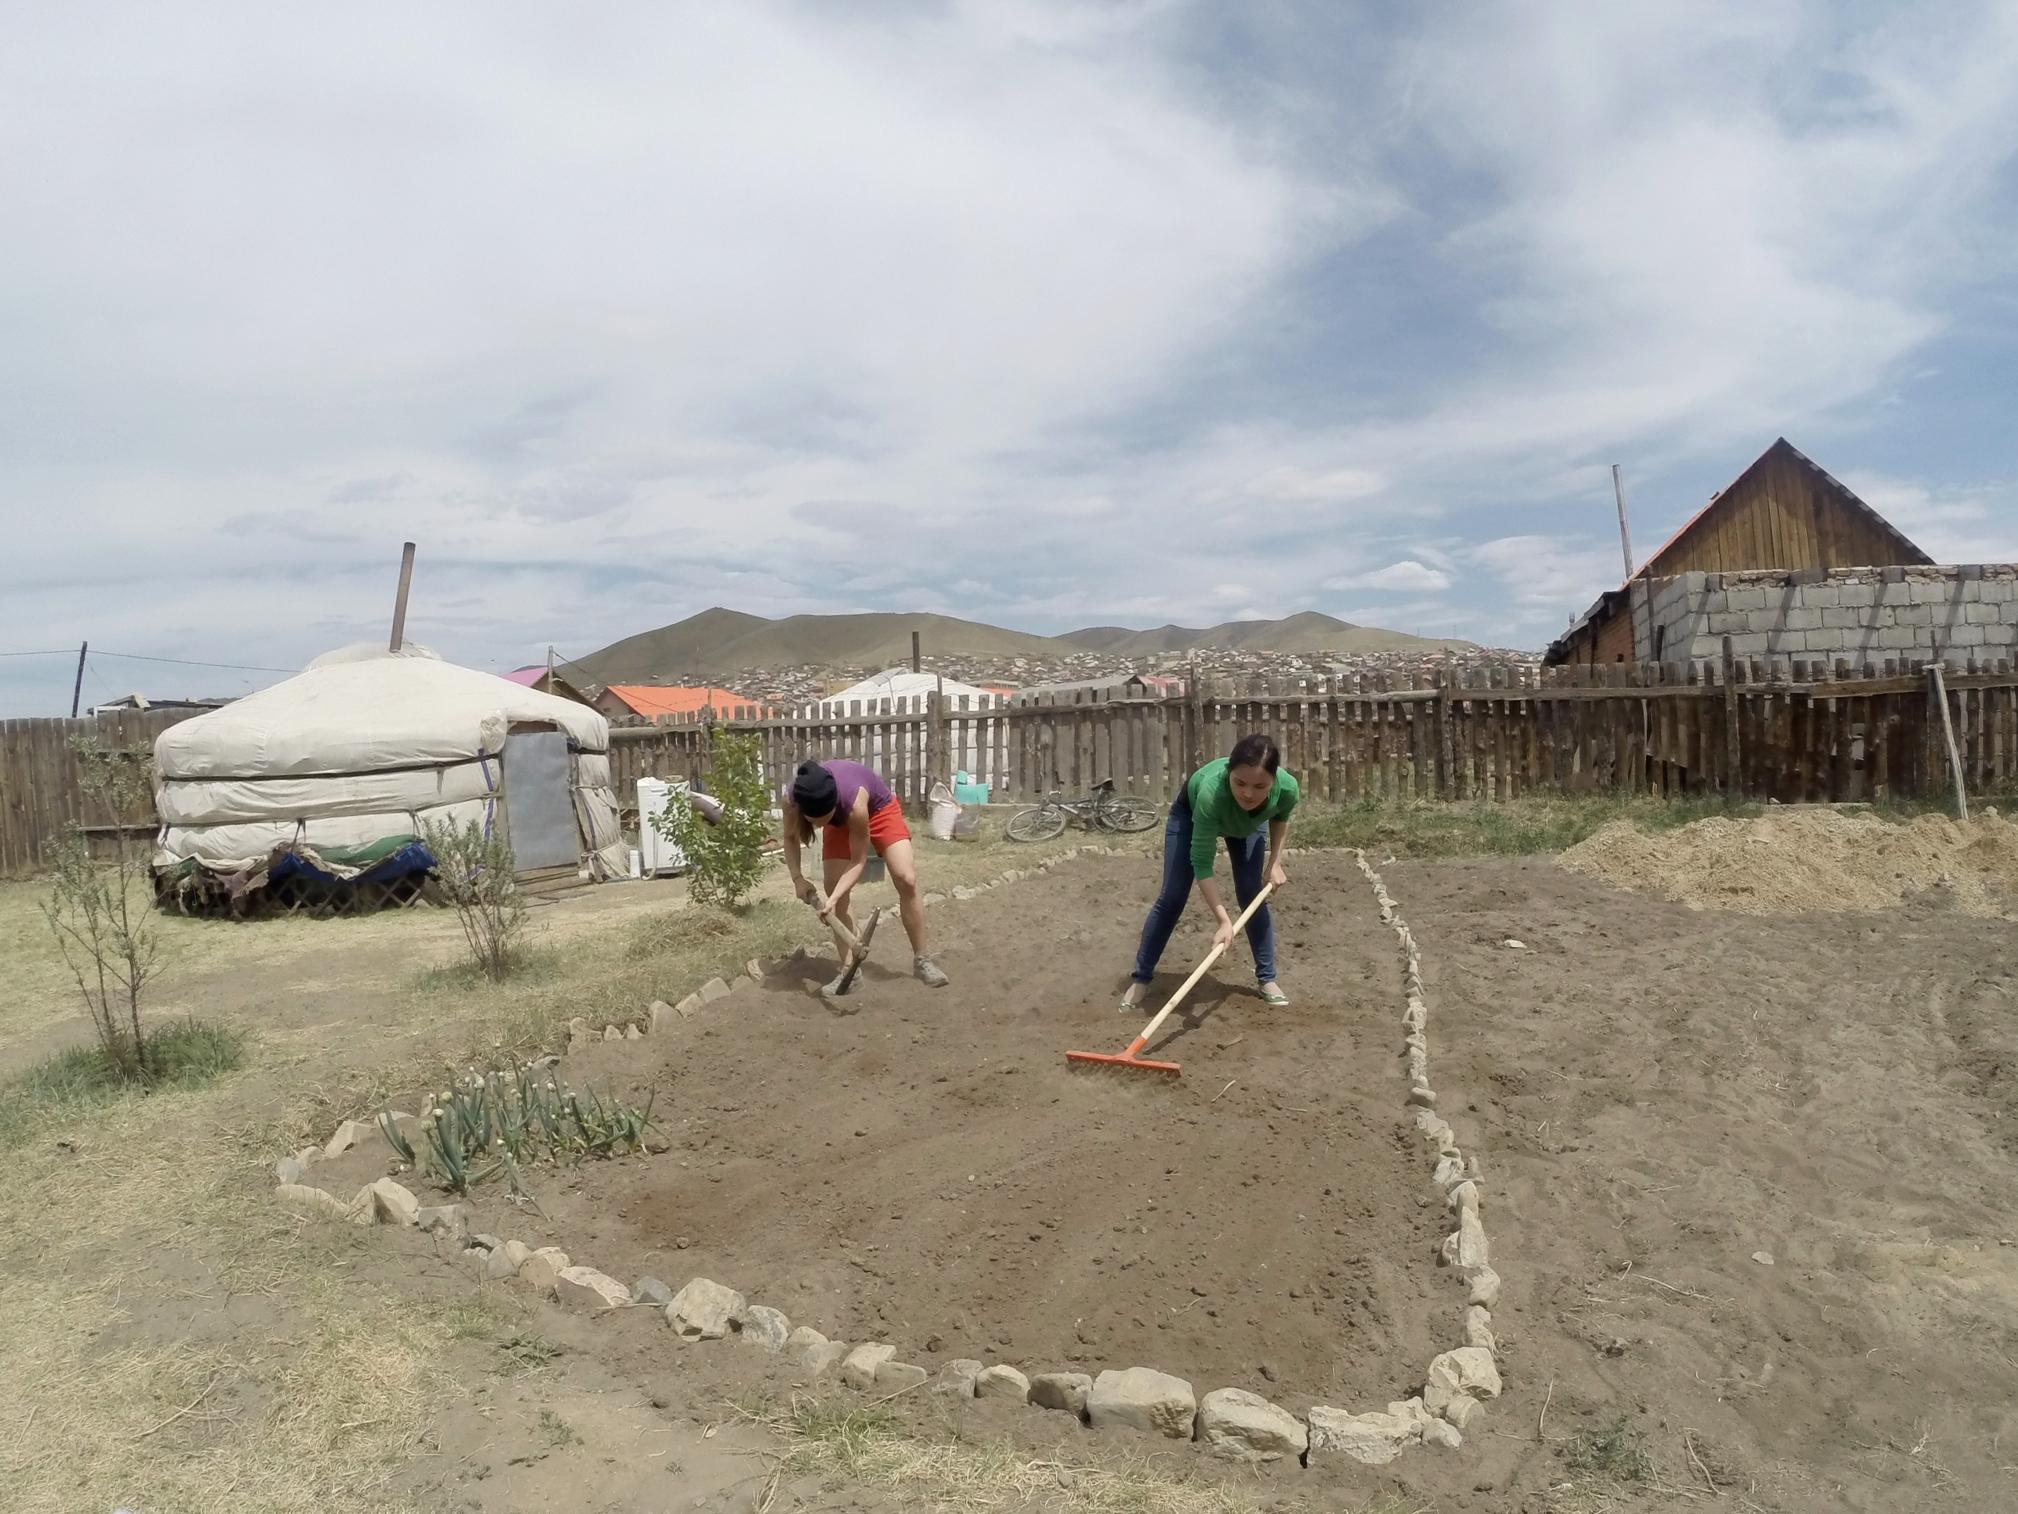 1 week of hard work to prepare the new garden